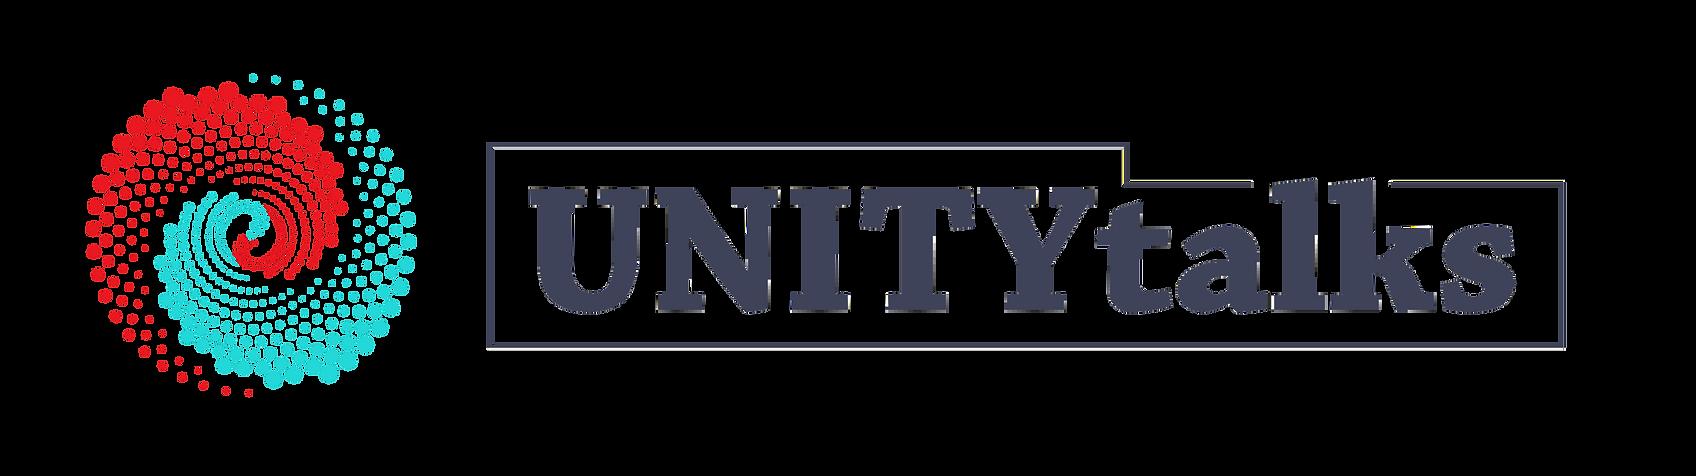 Unity_COLORS-06.png